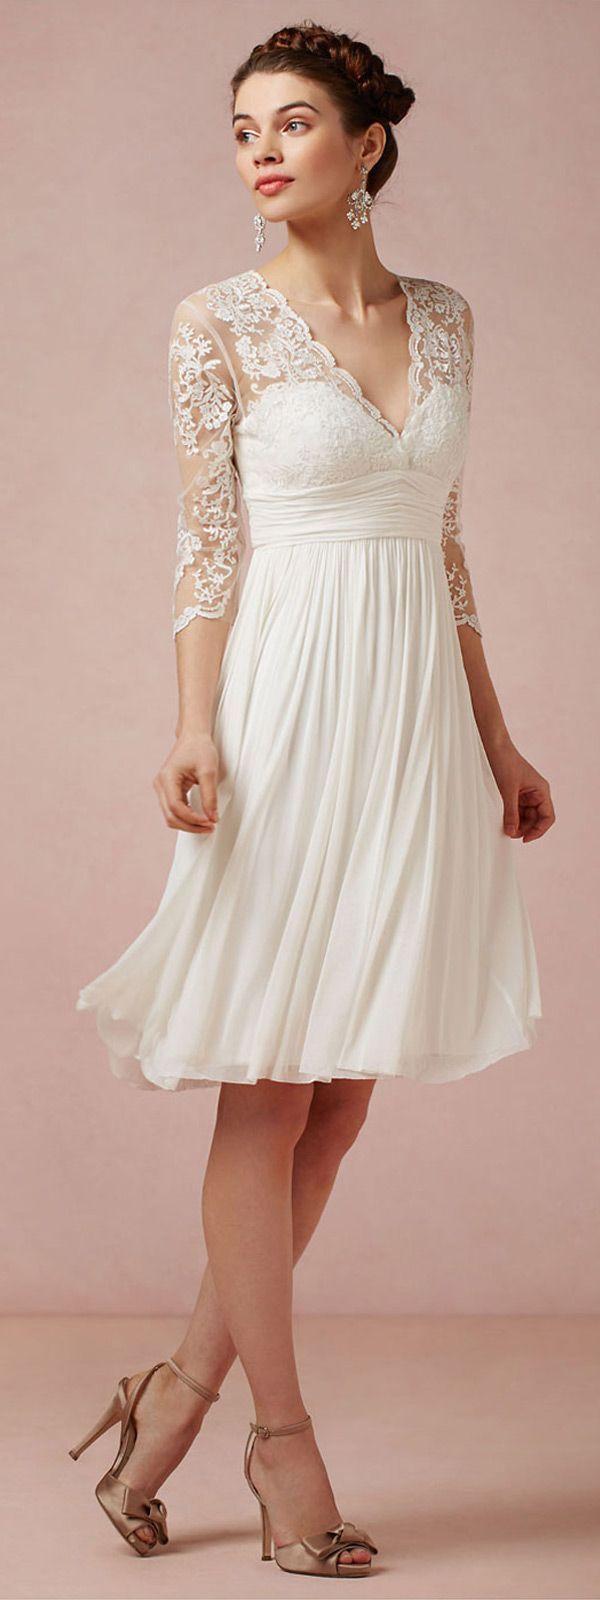 Off white short wedding dresses   Off White Short Wedding Dresses  Plus Size Dresses for Wedding